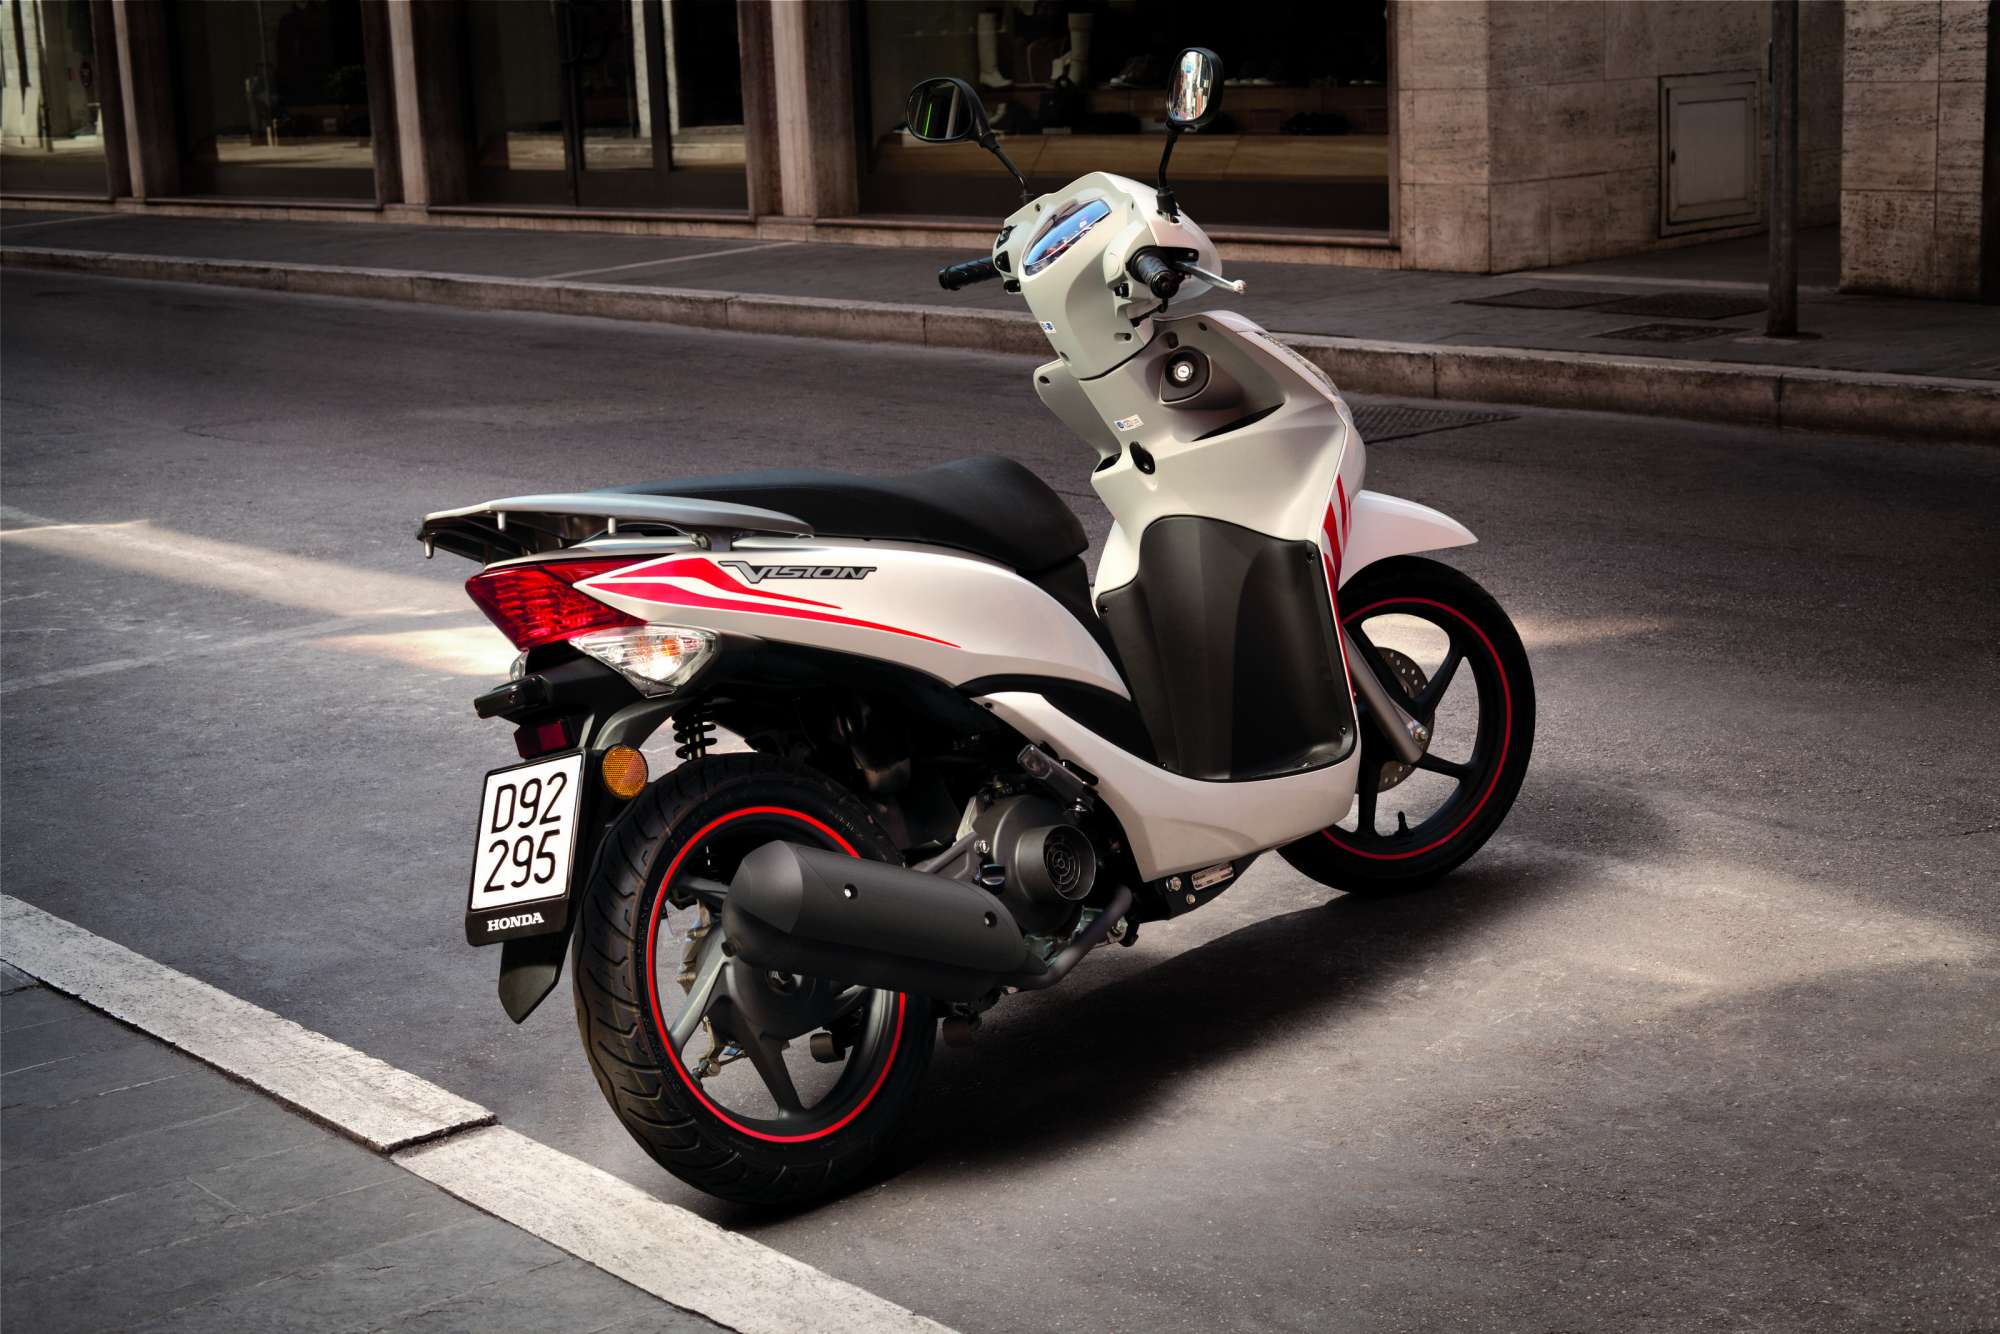 Honda Vision 50 Price